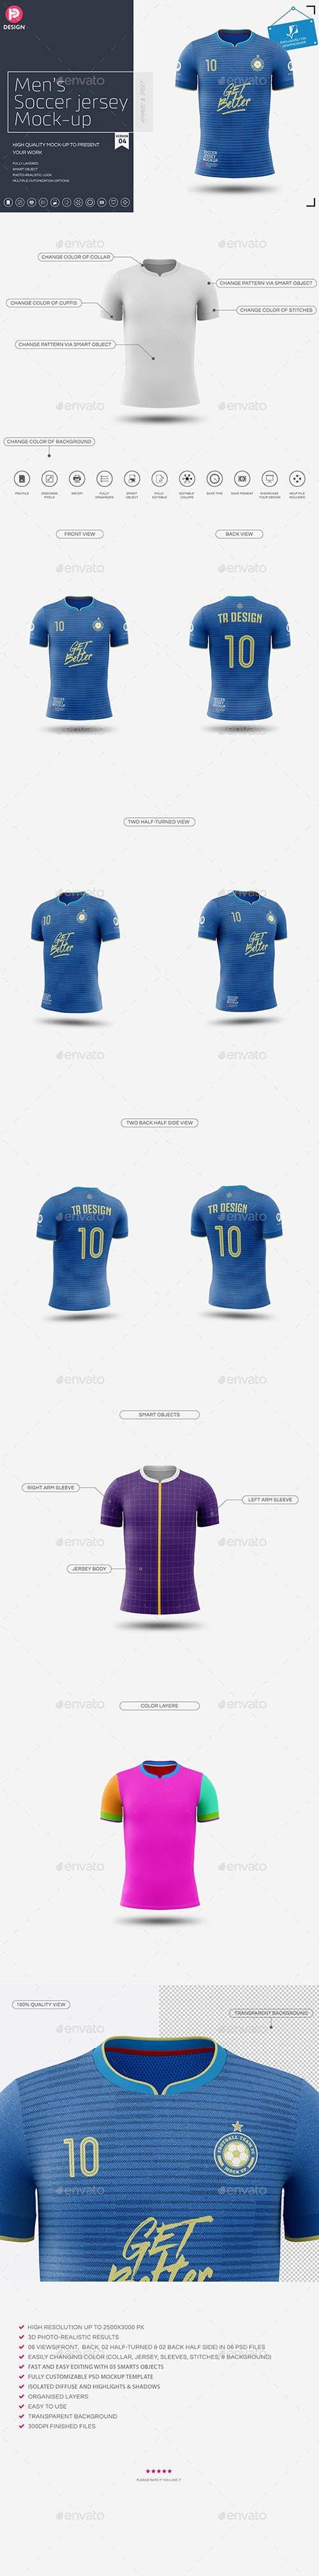 GraphicRiver - Men's Soccer Jersey Mockup V4 24229186